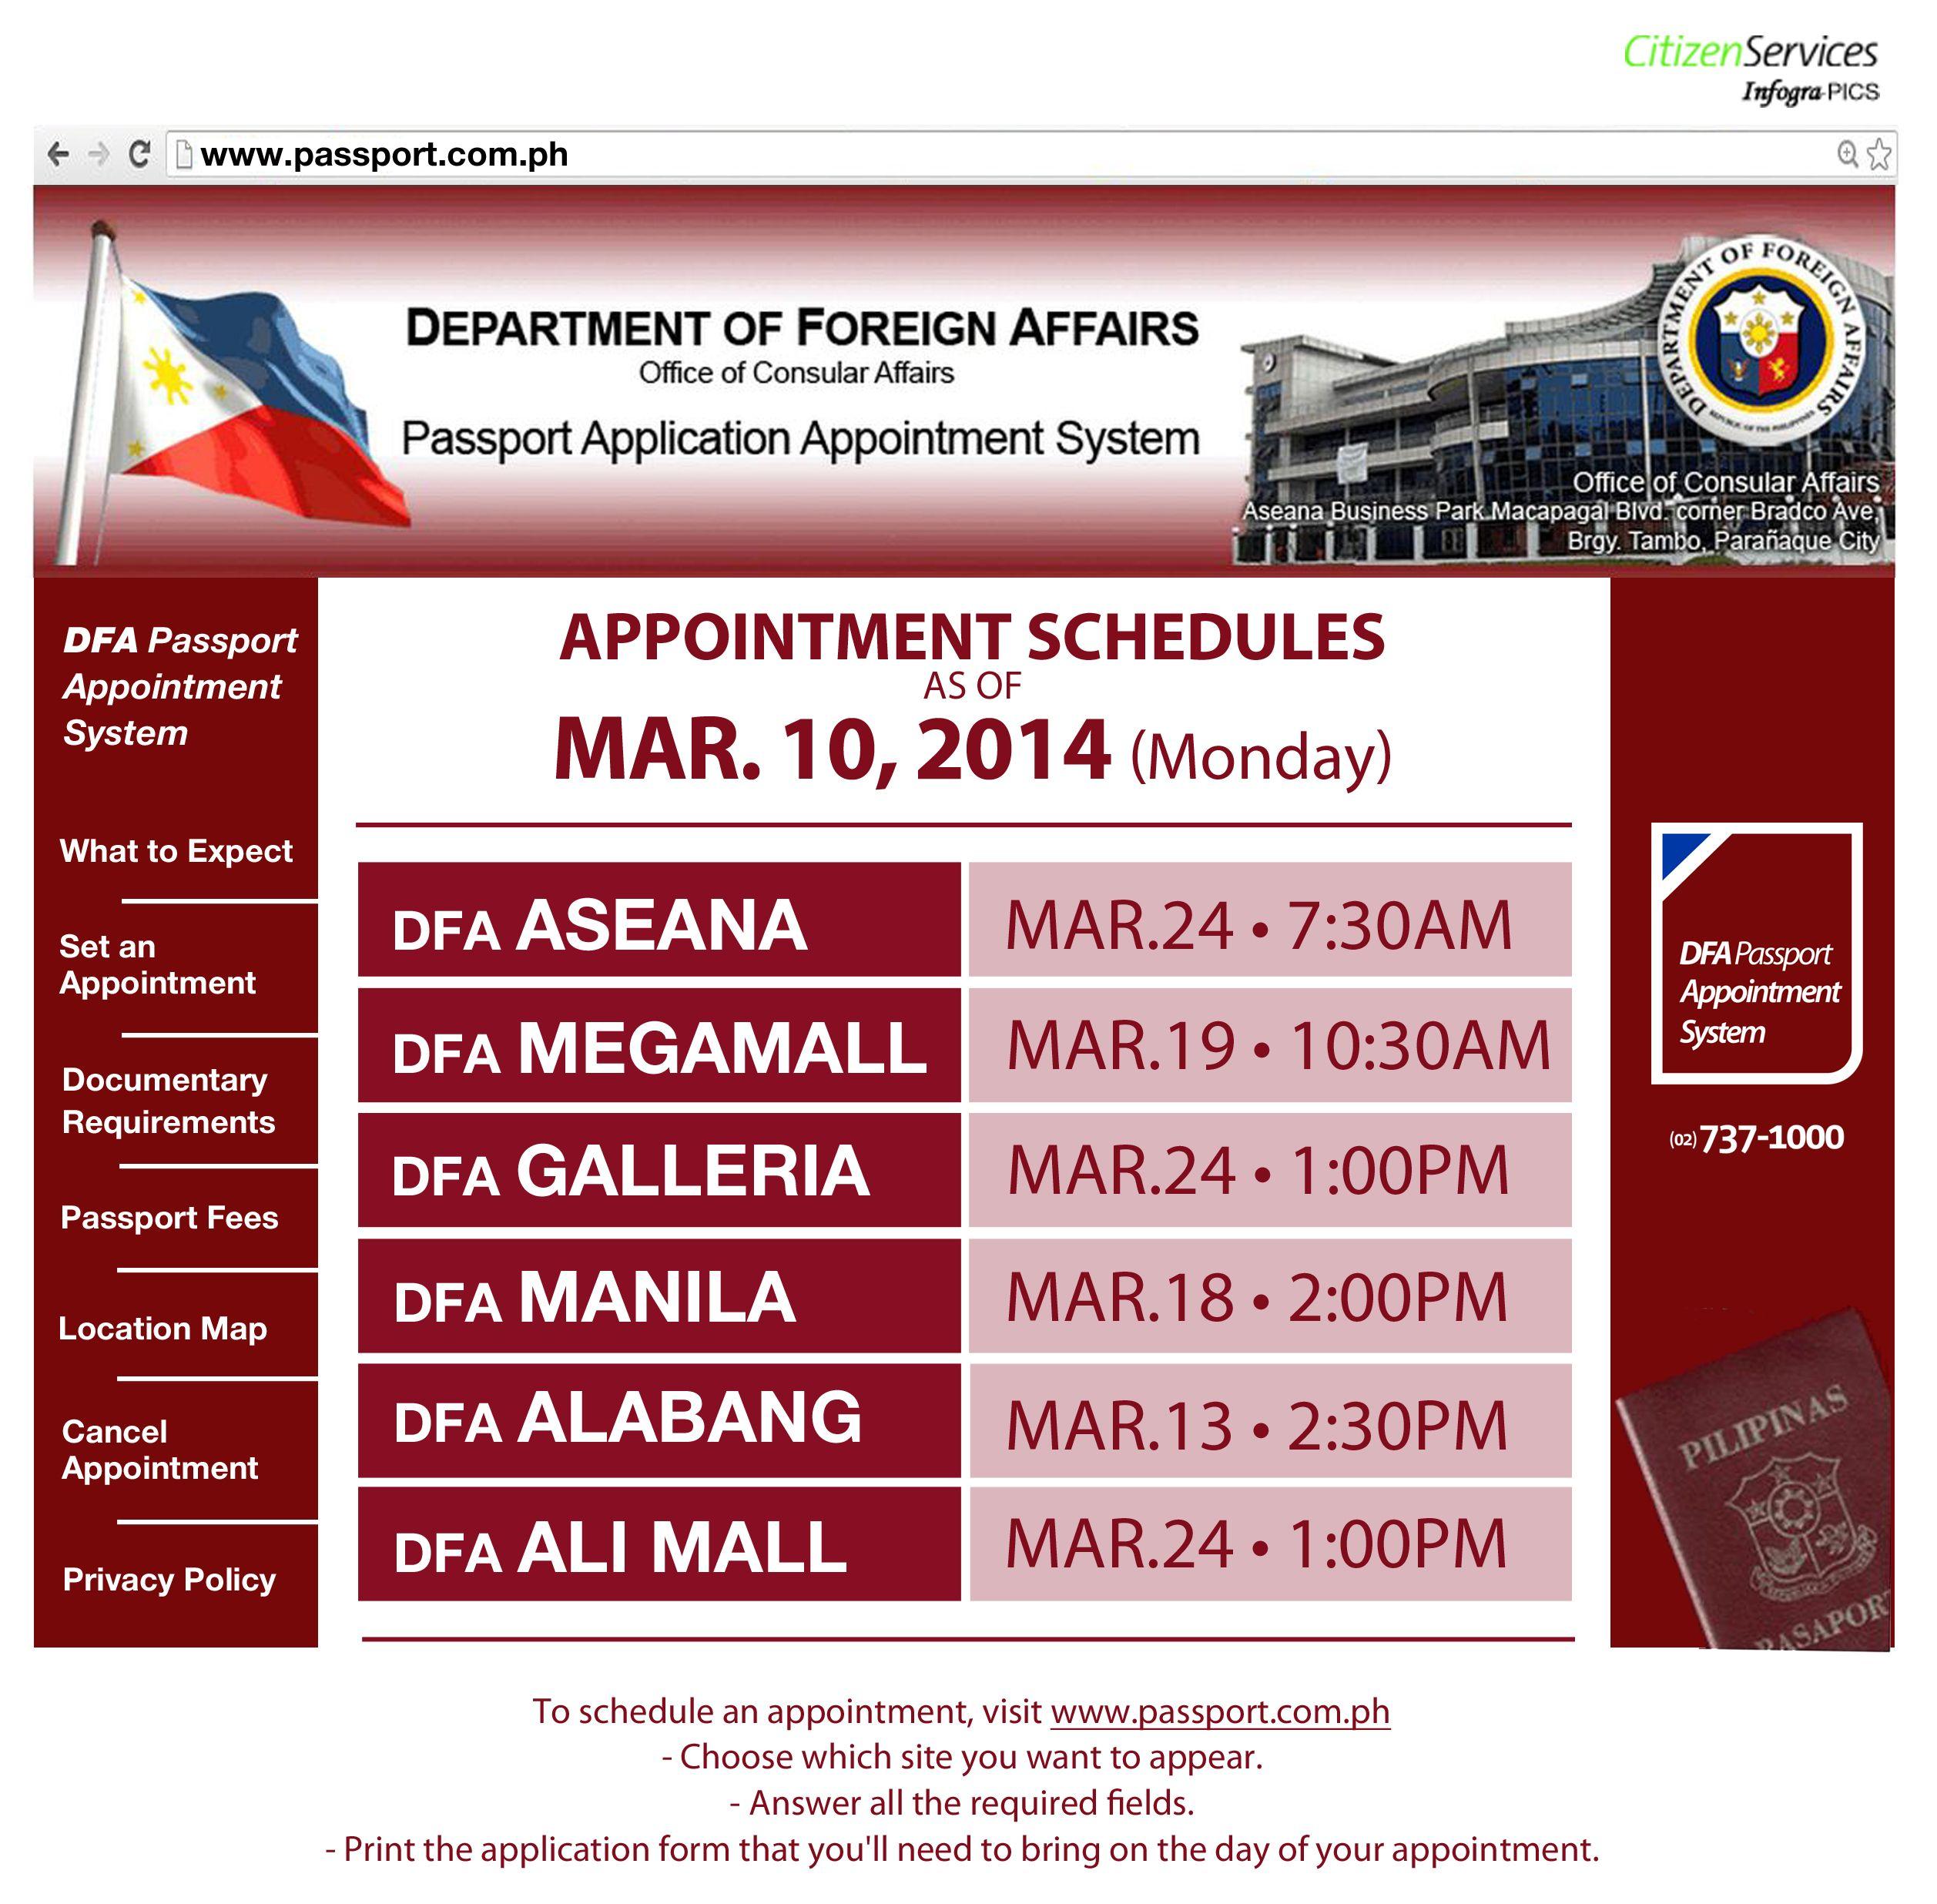 DFA Passport Appointment schedule update: March 10, 2014 #Citizenservices #DFAPassportappointment #Monday